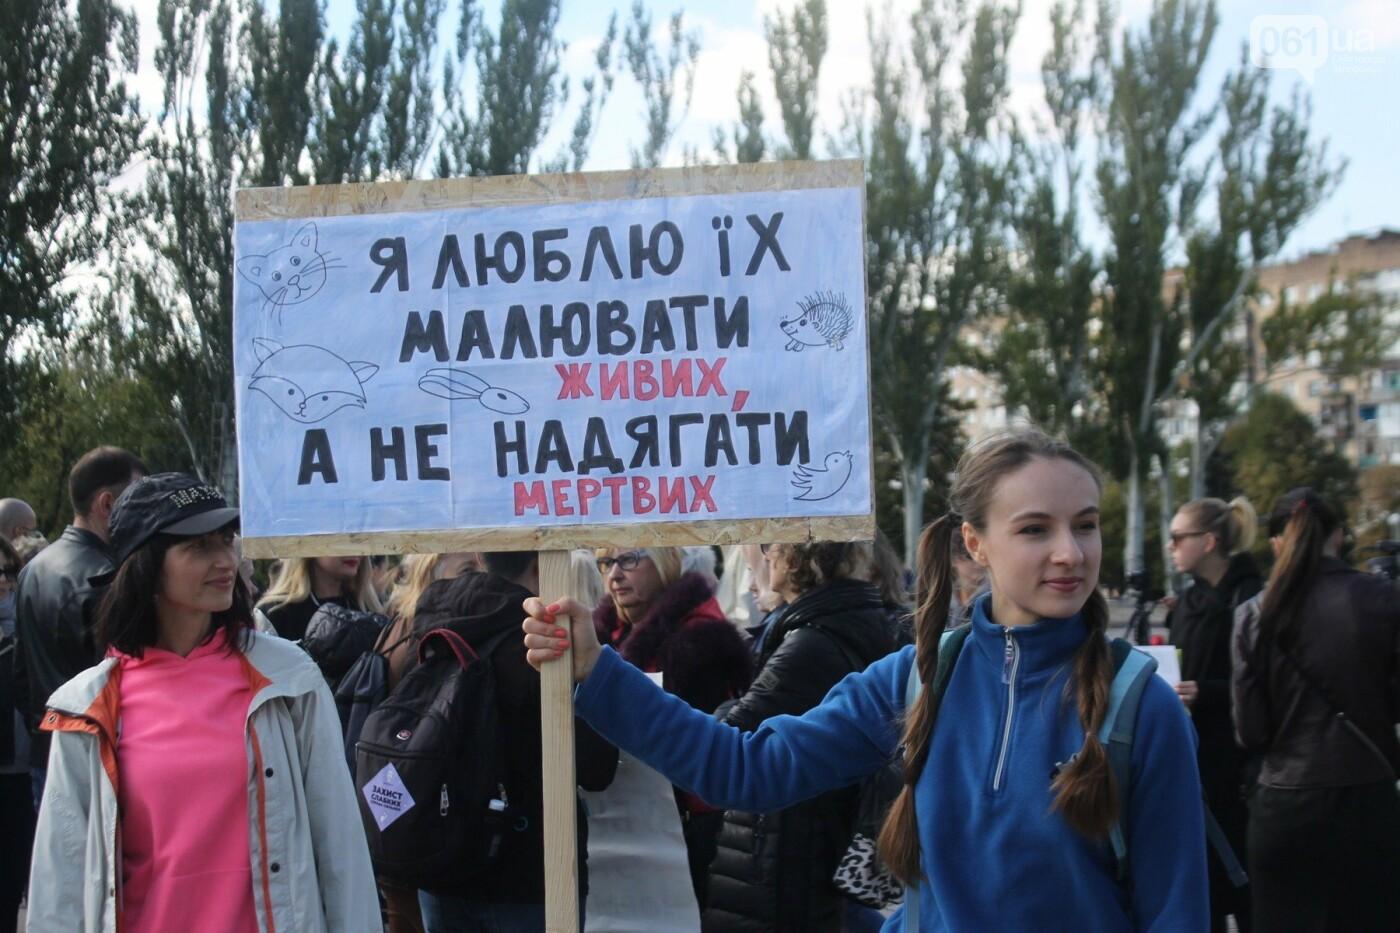 «Защити! Не мучай»: в Запорожье провели марш за права животных, – ФОТОРЕПОРТАЖ, ВИДЕО, фото-1